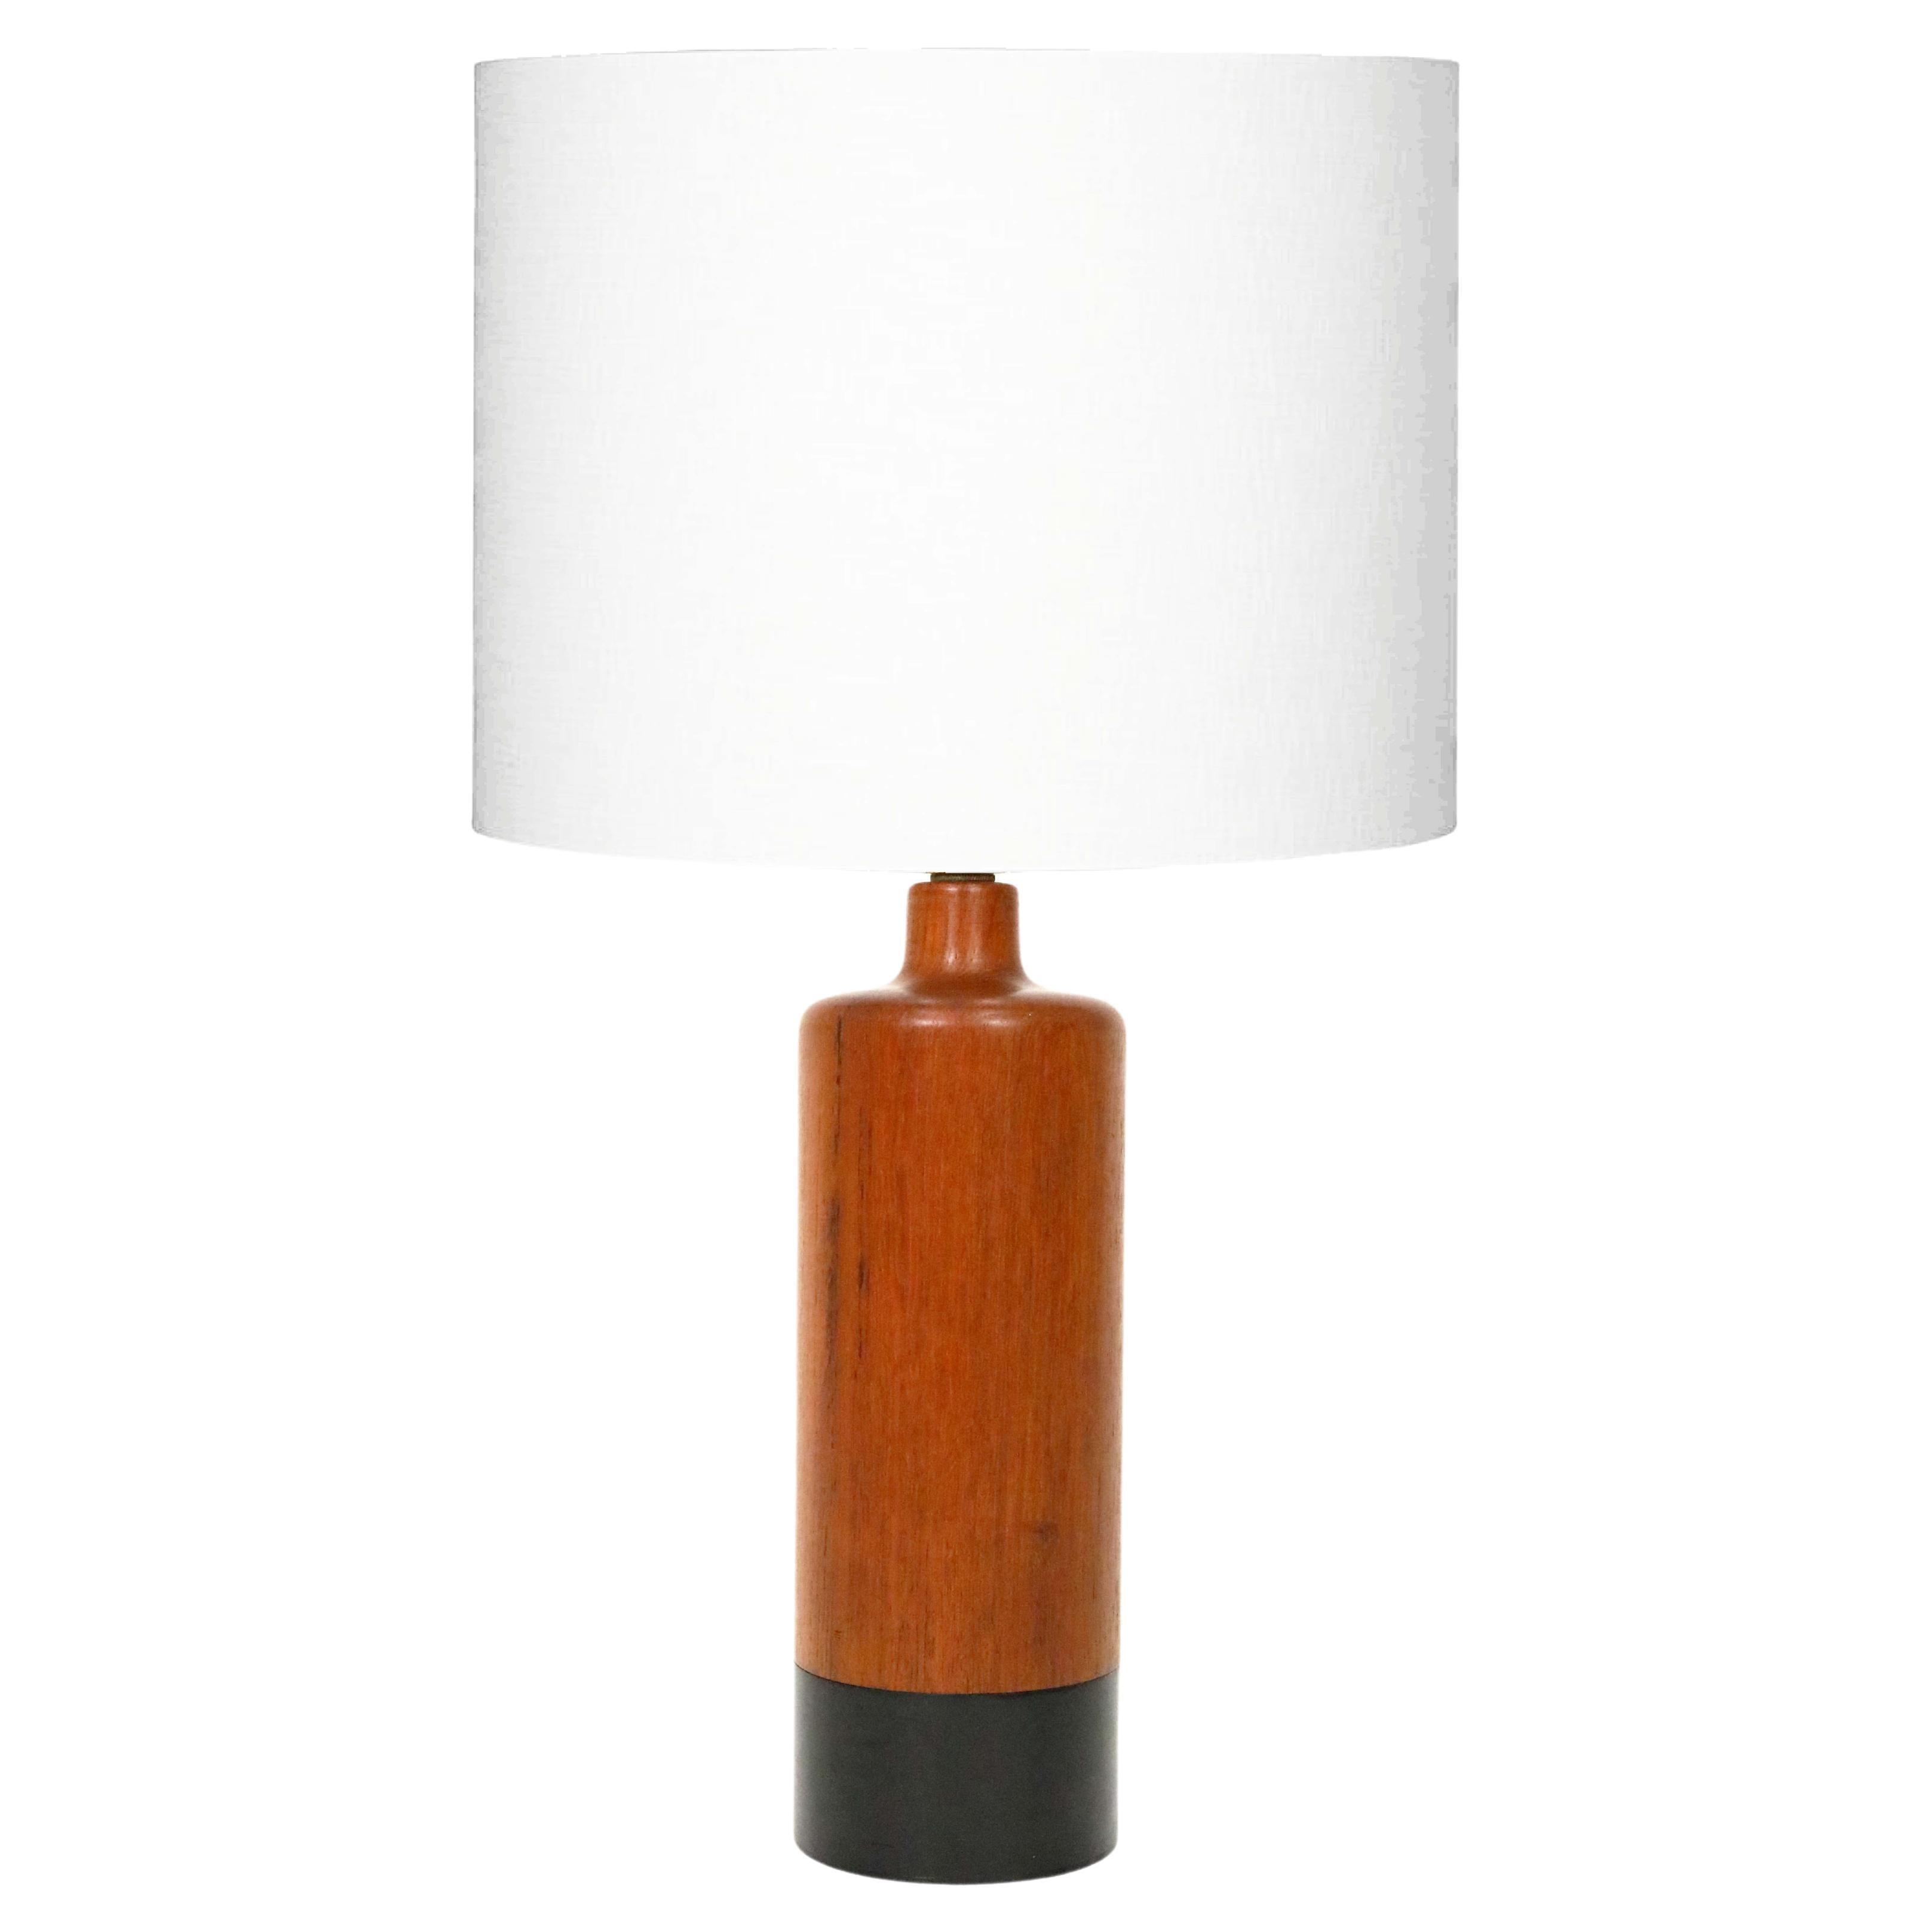 Danish Teak Lamp with Black Leather by ESA